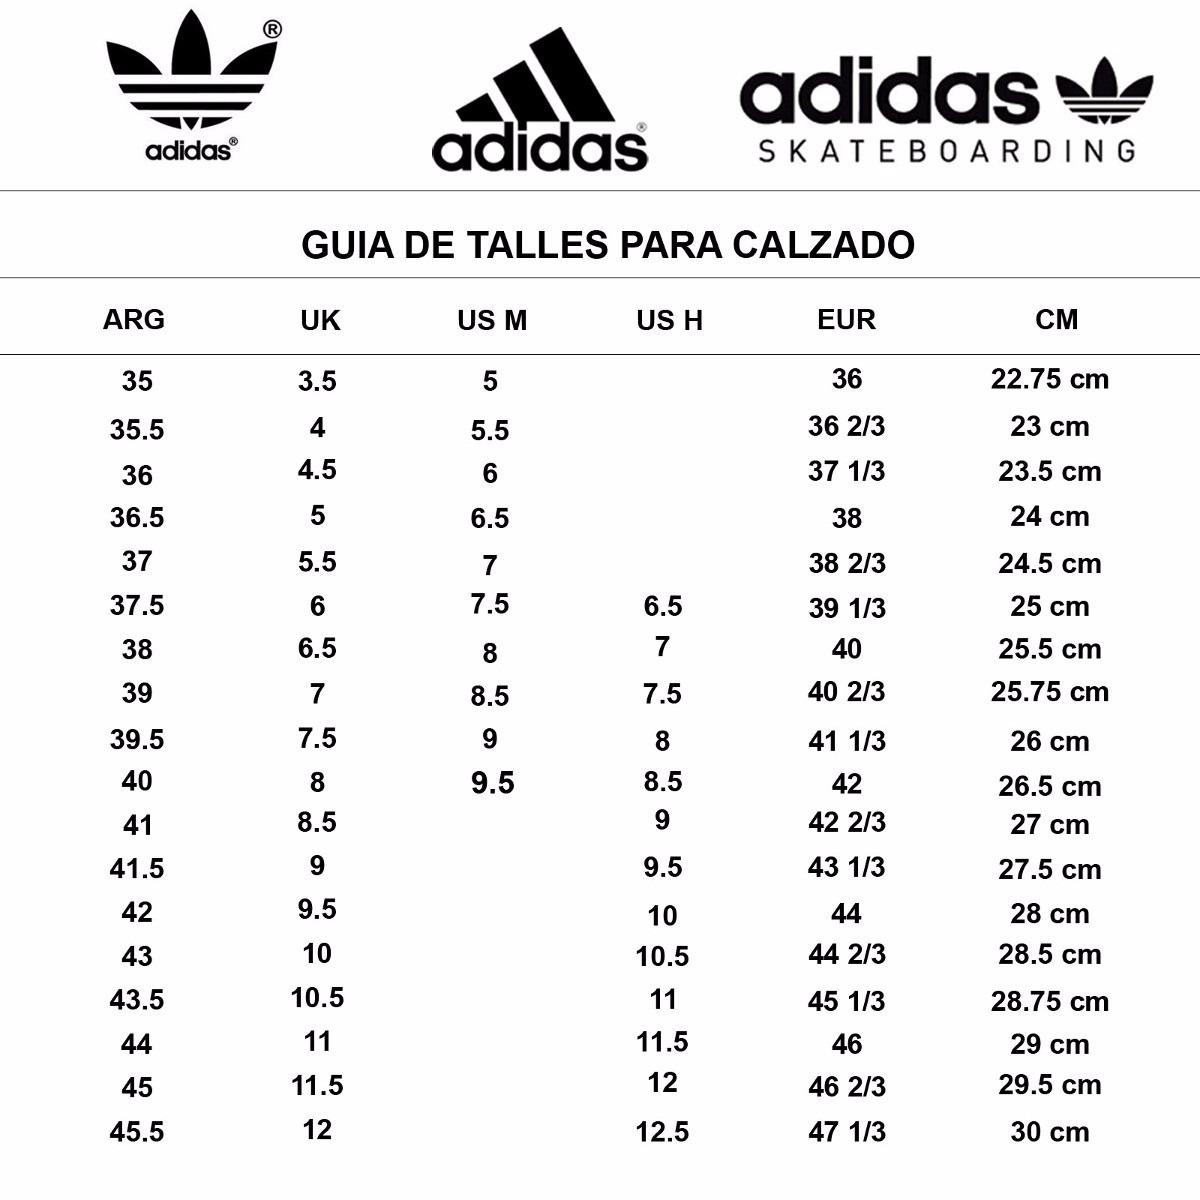 9 En Botas Tactico 00 7 Gsg 500 43 Talle 10 Adidas Borceguies qBPwBxR6